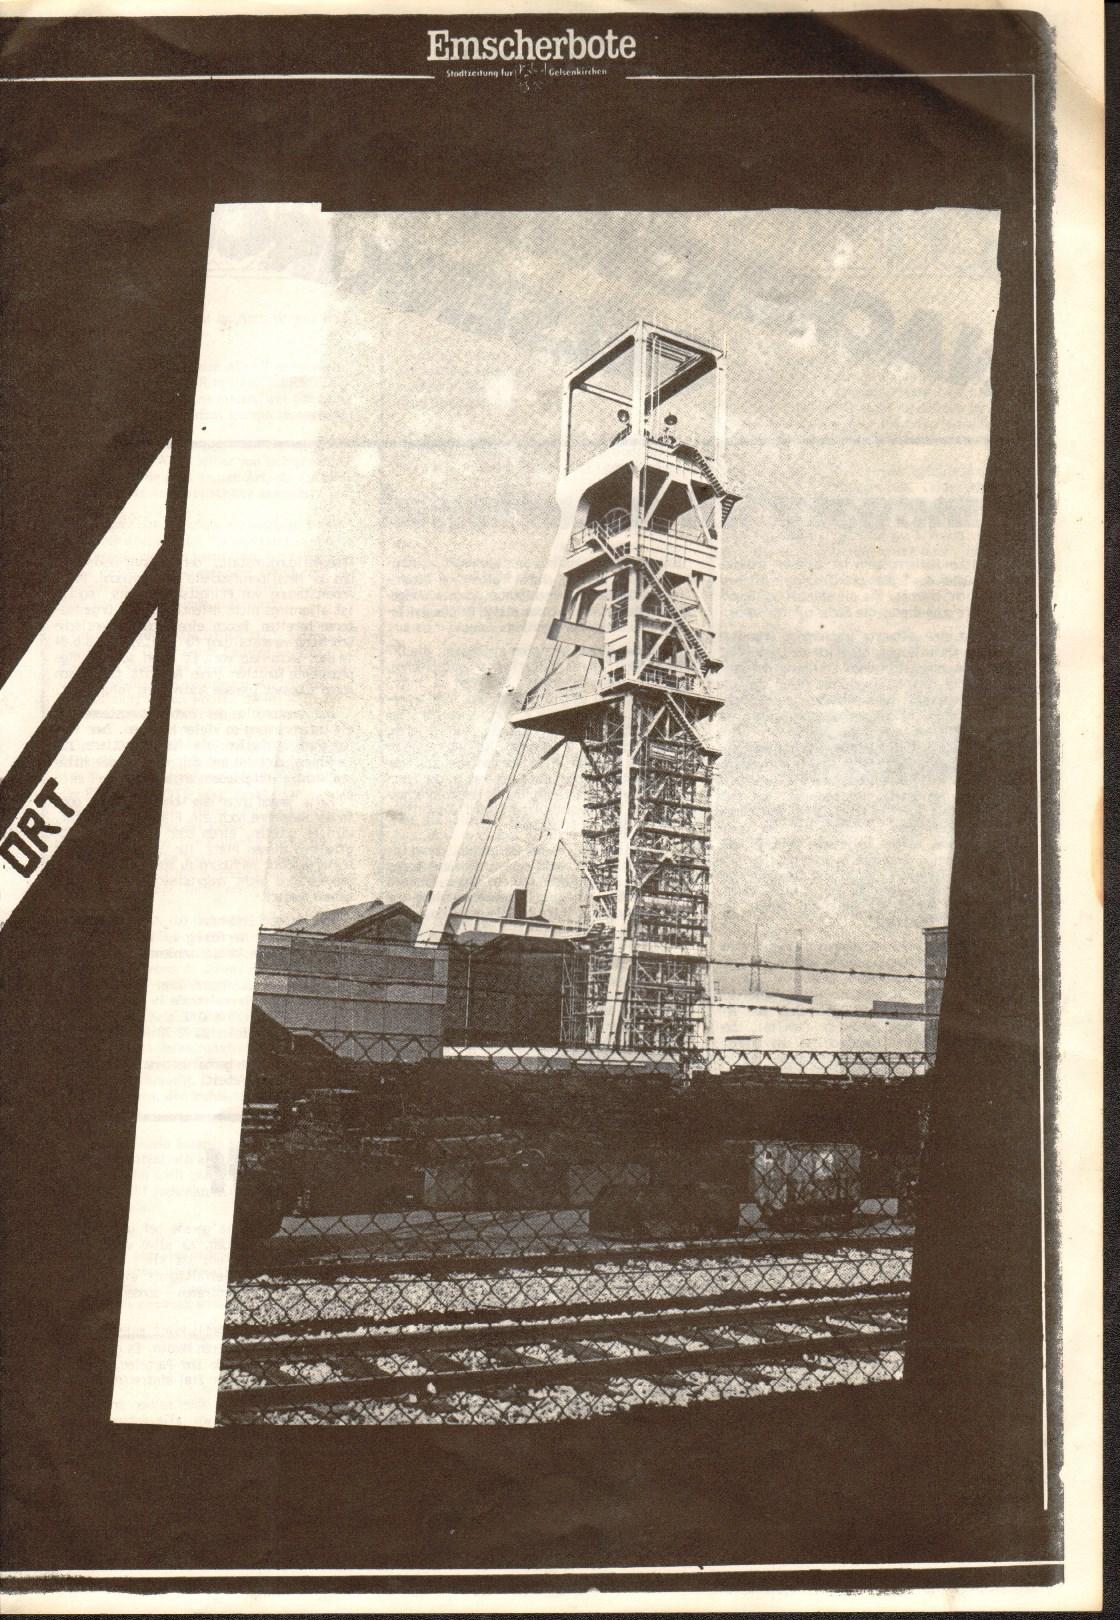 Gelsenkirchen_Emscherbote_1984_37_13